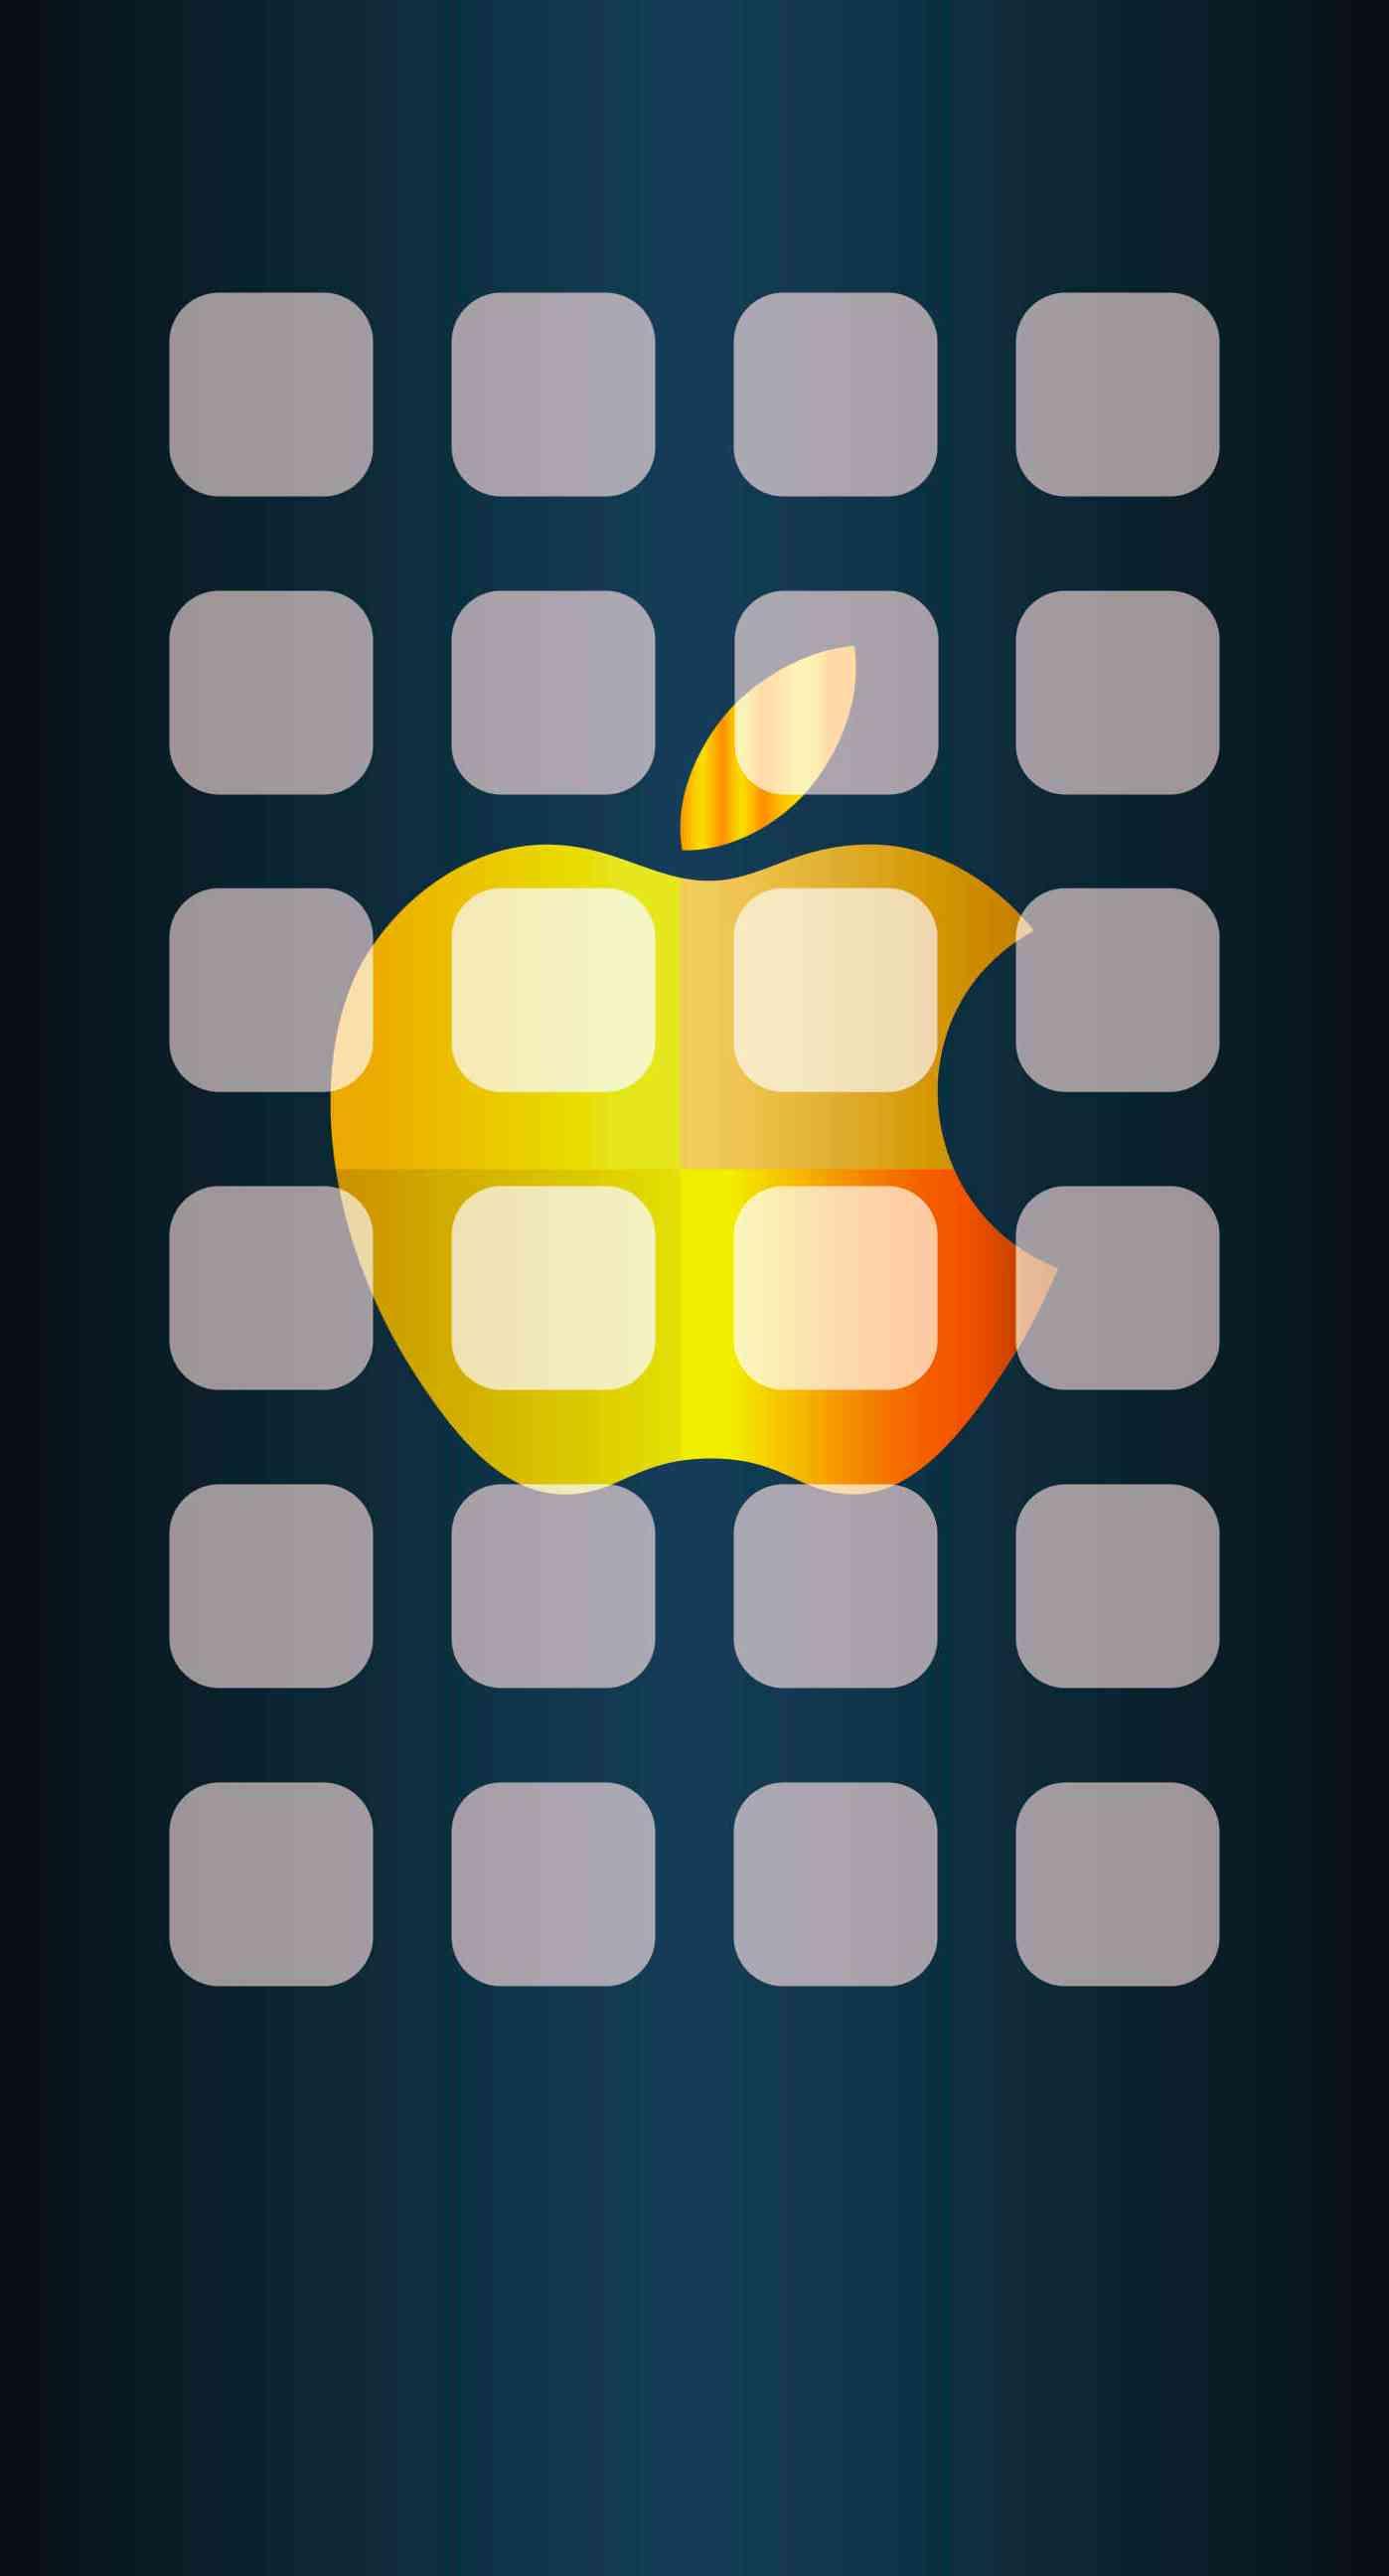 Wallpaper iphone kuning - Keren Rak Apel Biru Dan Kuning Iphone7 Plus Wallpaper